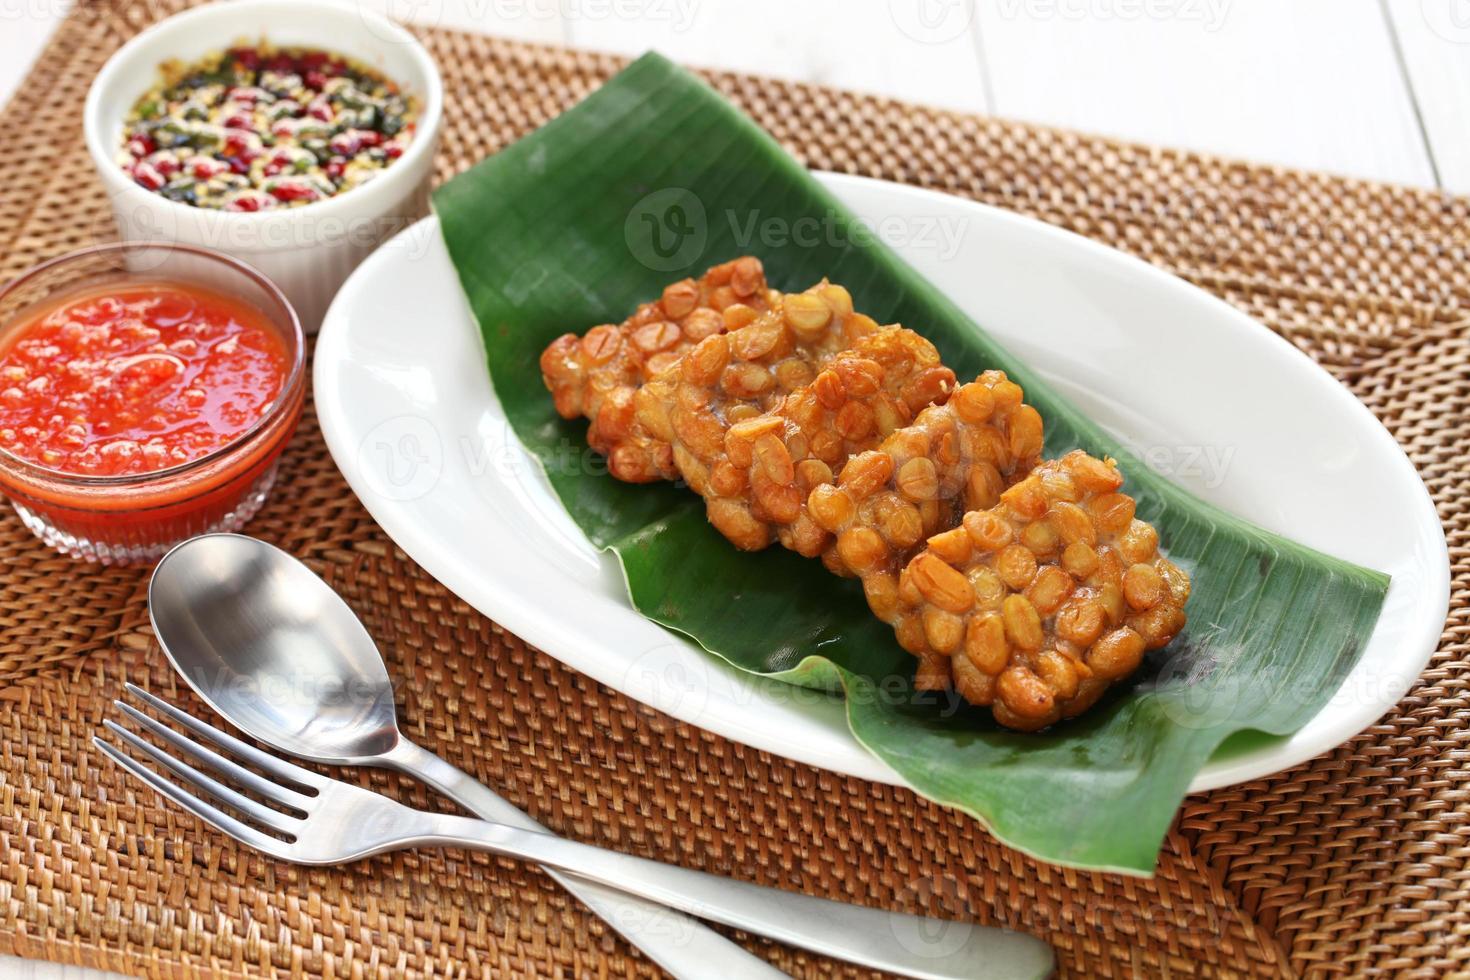 tempe goreng, fried tempeh, indonesian vegetarian food photo